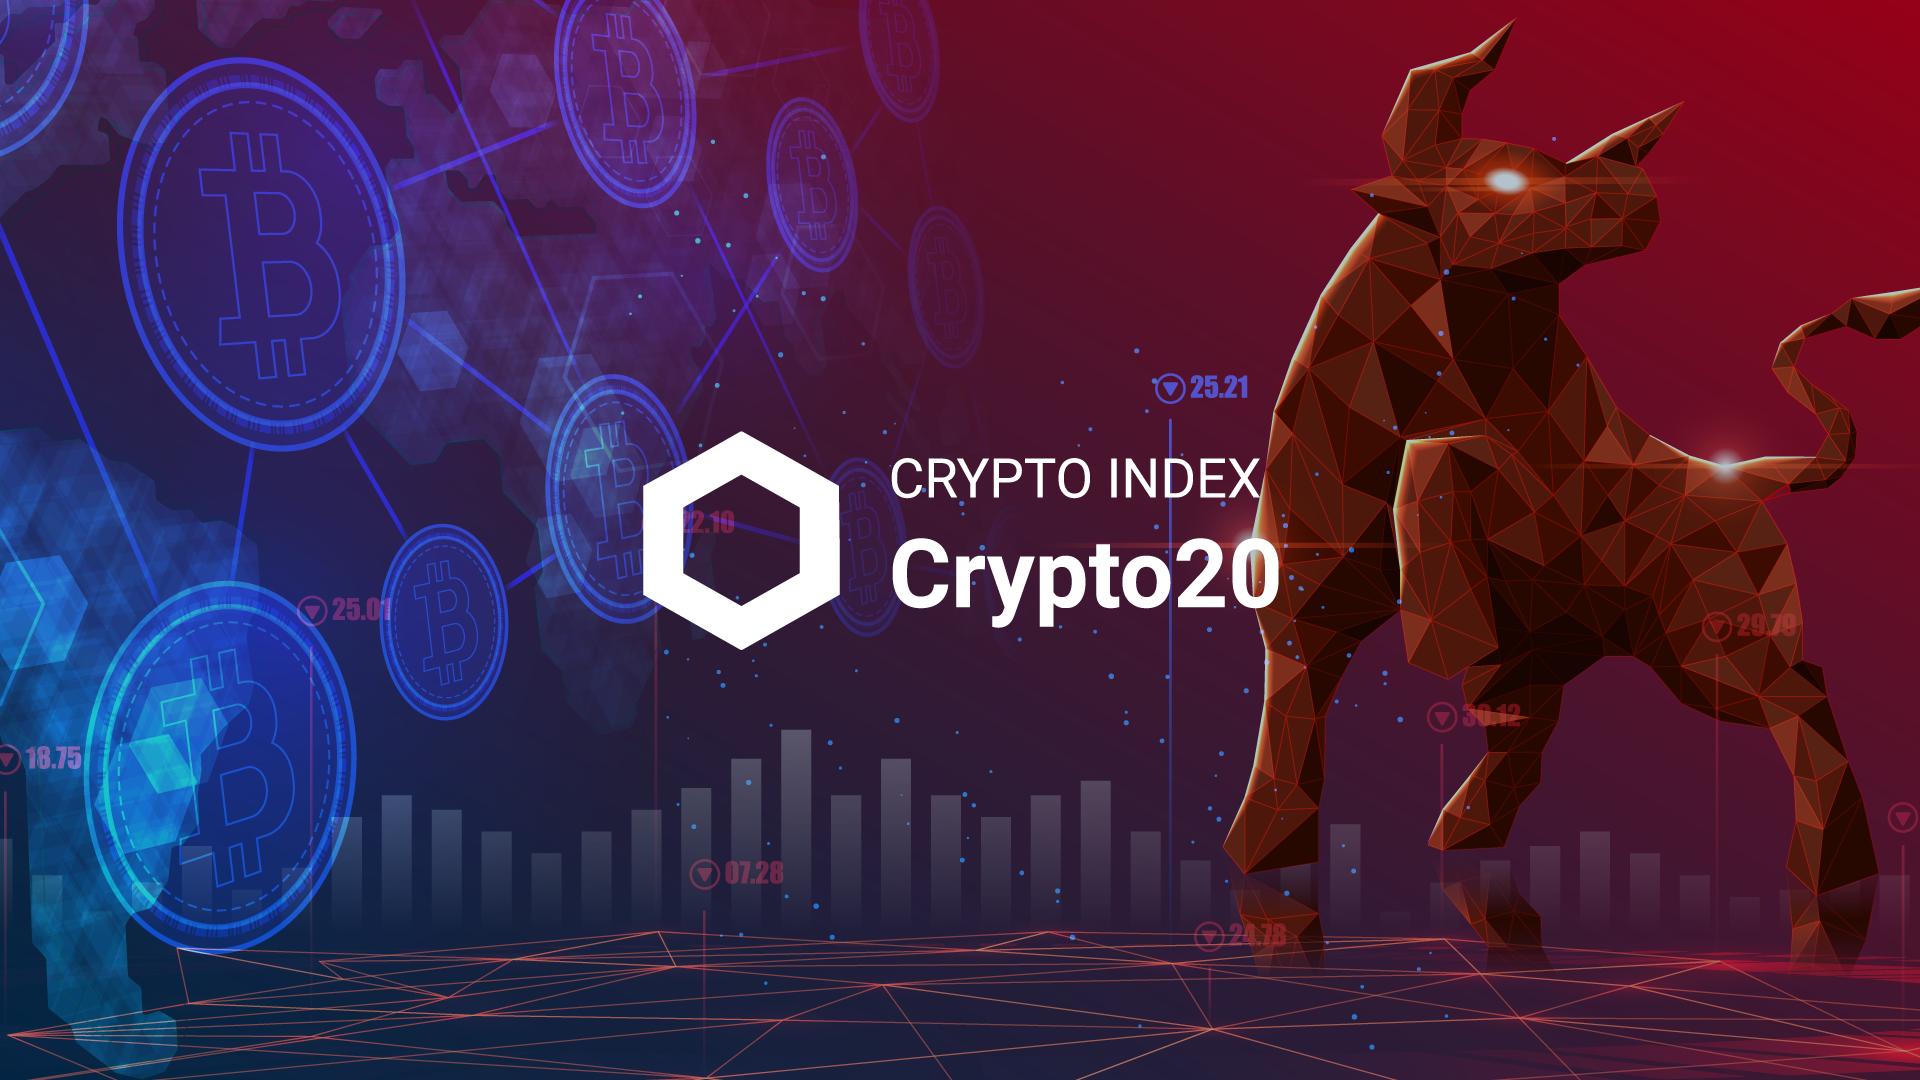 C20.blockchainnews-image.png